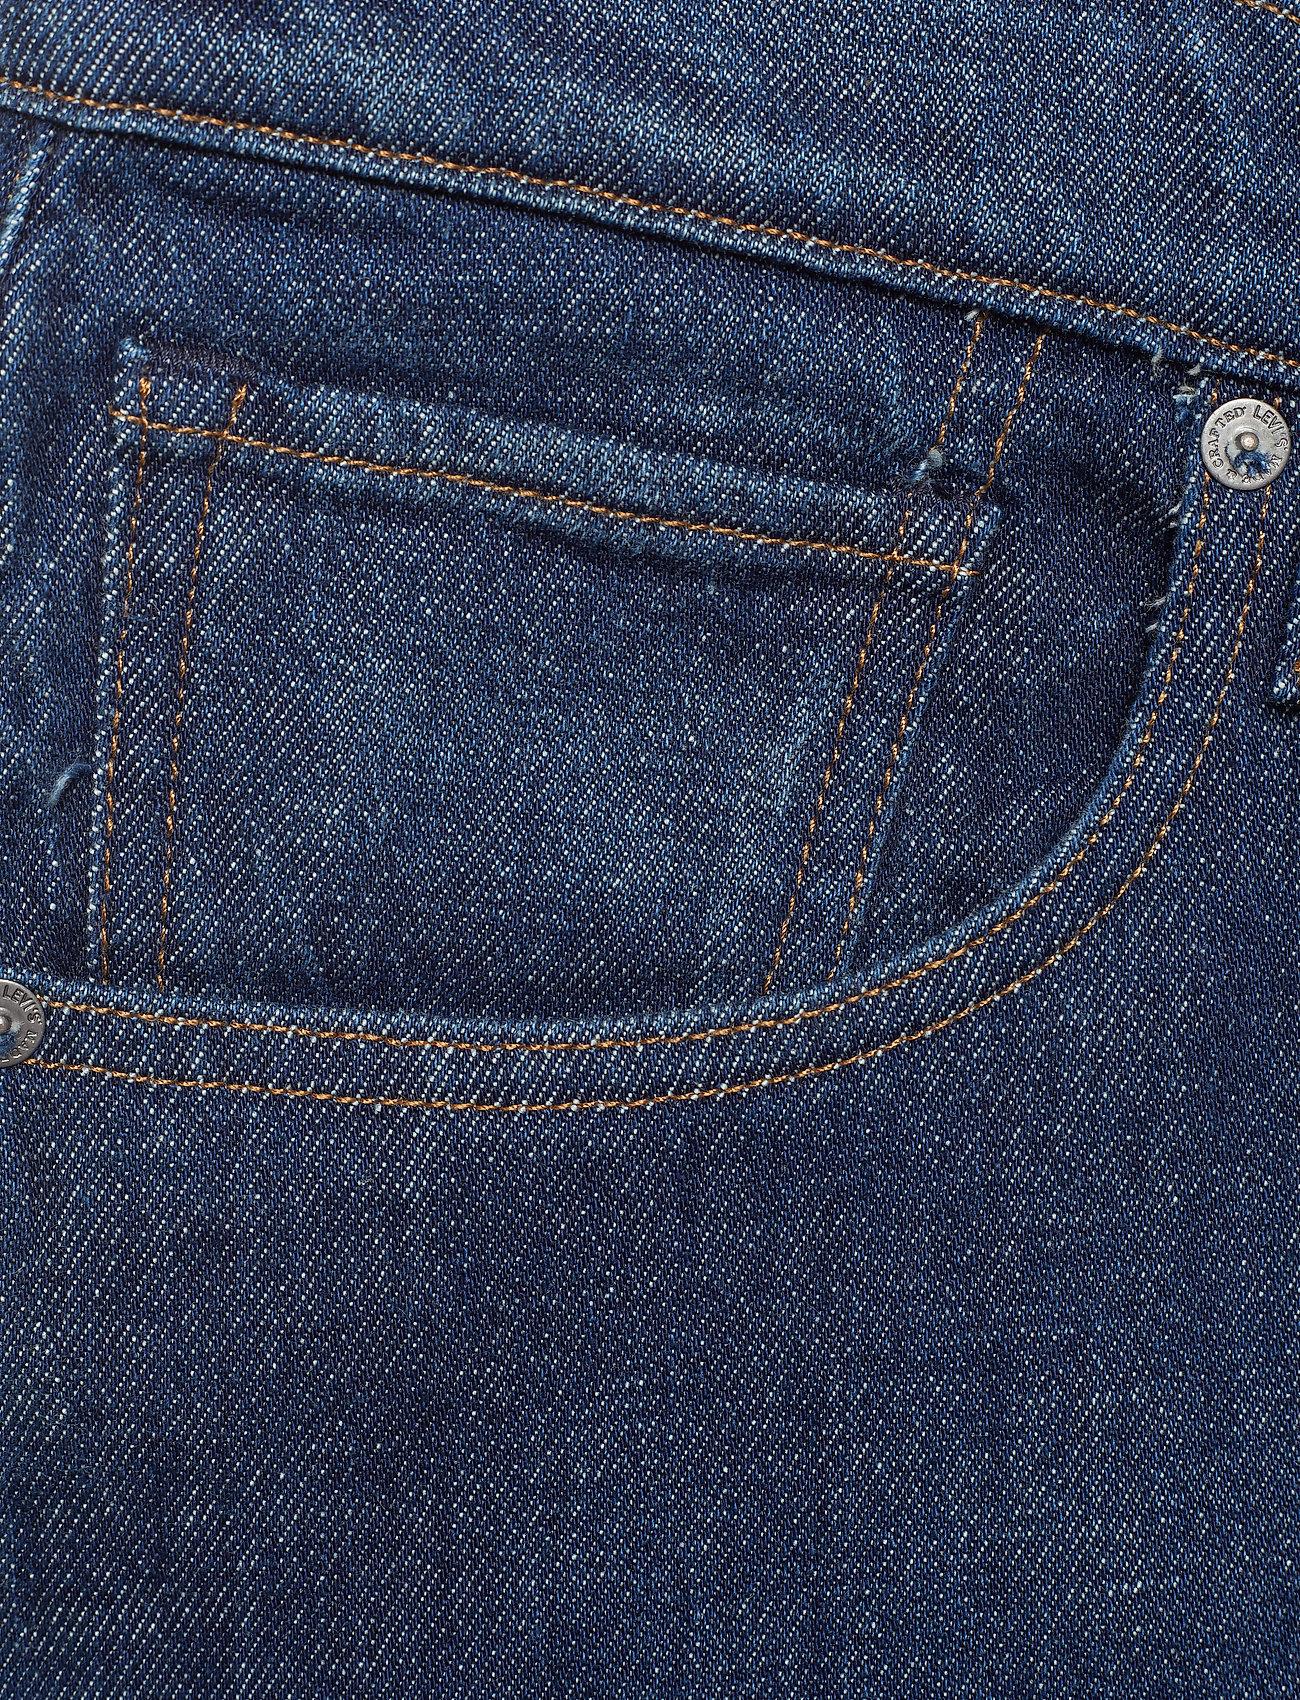 Levi's Made & Crafted LMC 512 LMC BUCHANAN- Jeans PtaZwkYm vB72l yz1sRm6O